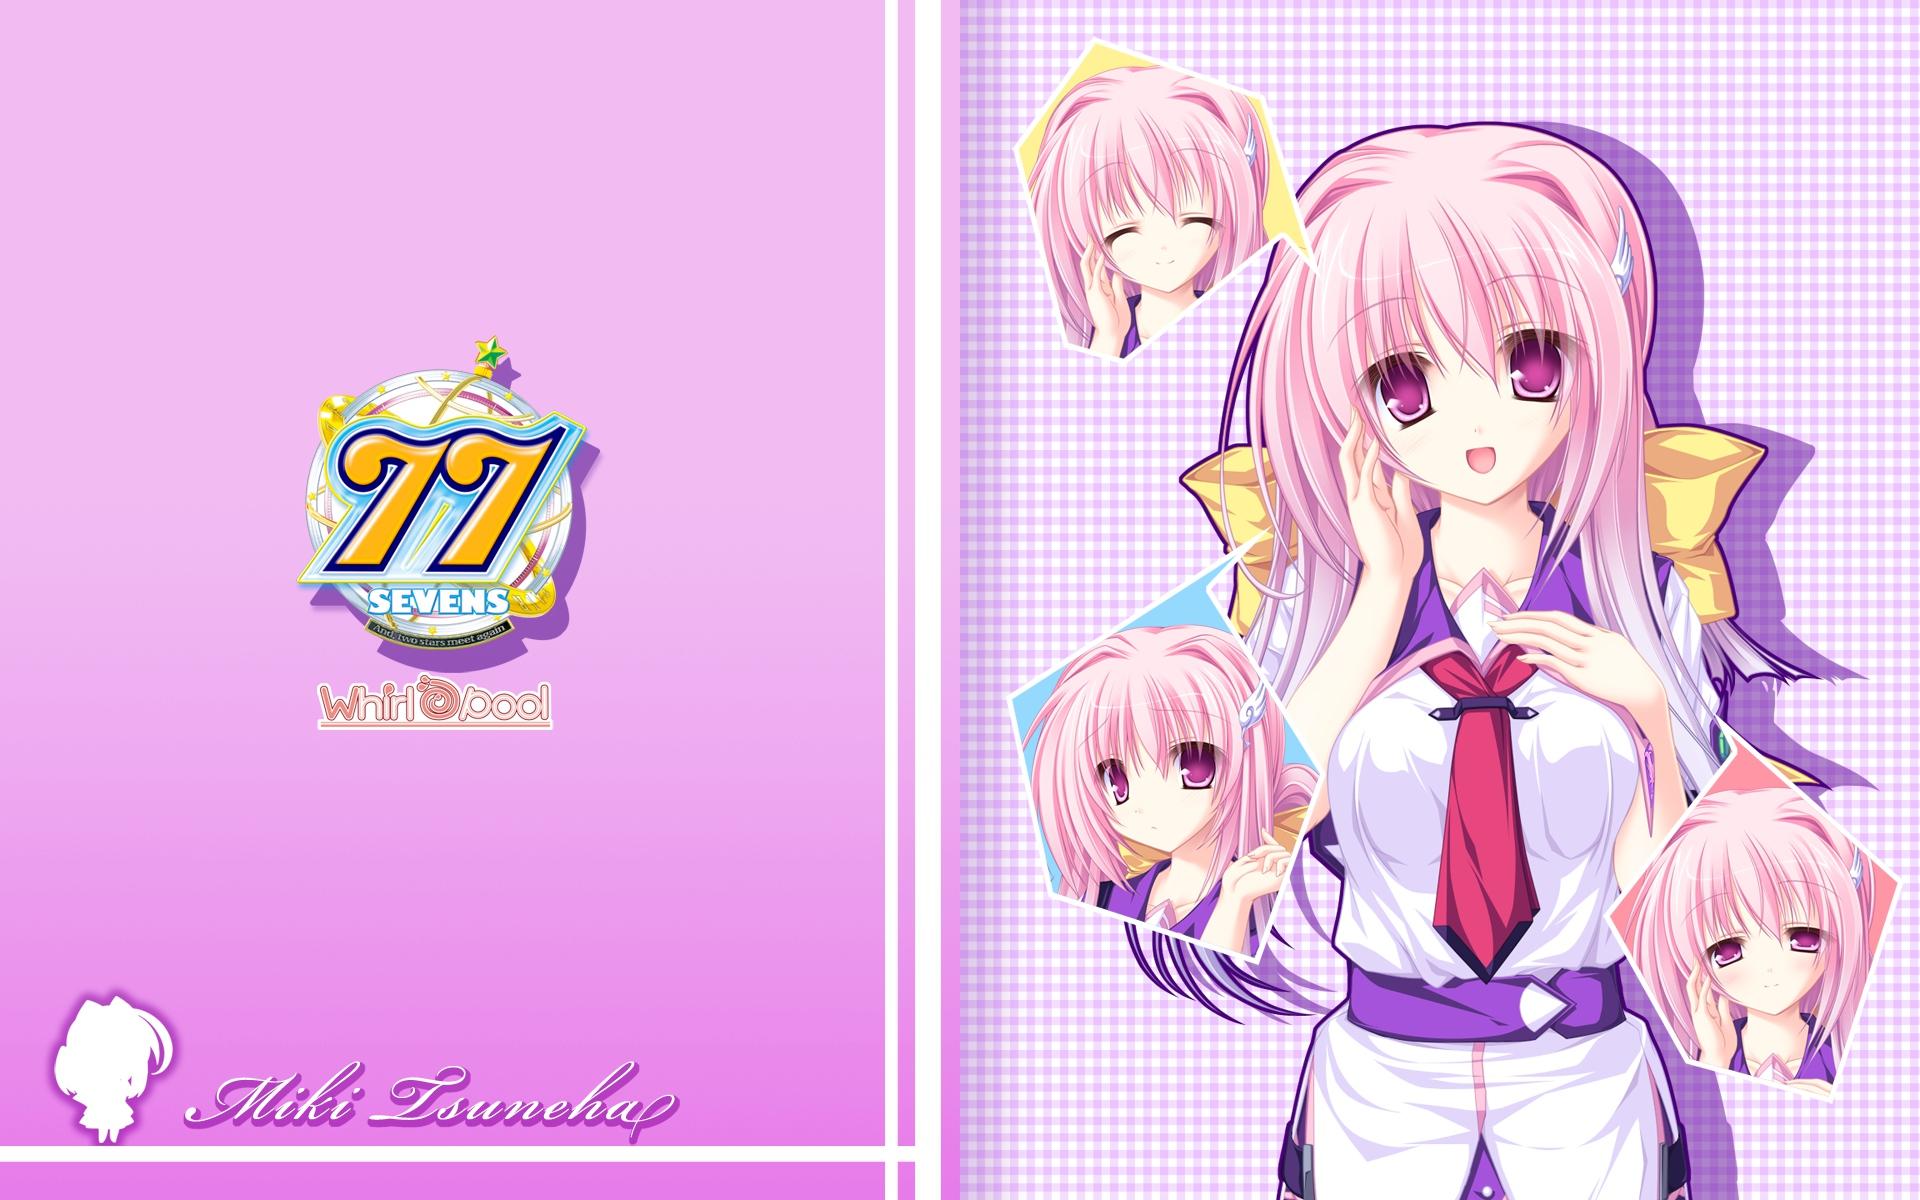 Sevens And Two Stars Meet Again Isuneha Miki Anime Anime Girls Multi Colored Hair Pink Hair Purple T 1920x1200